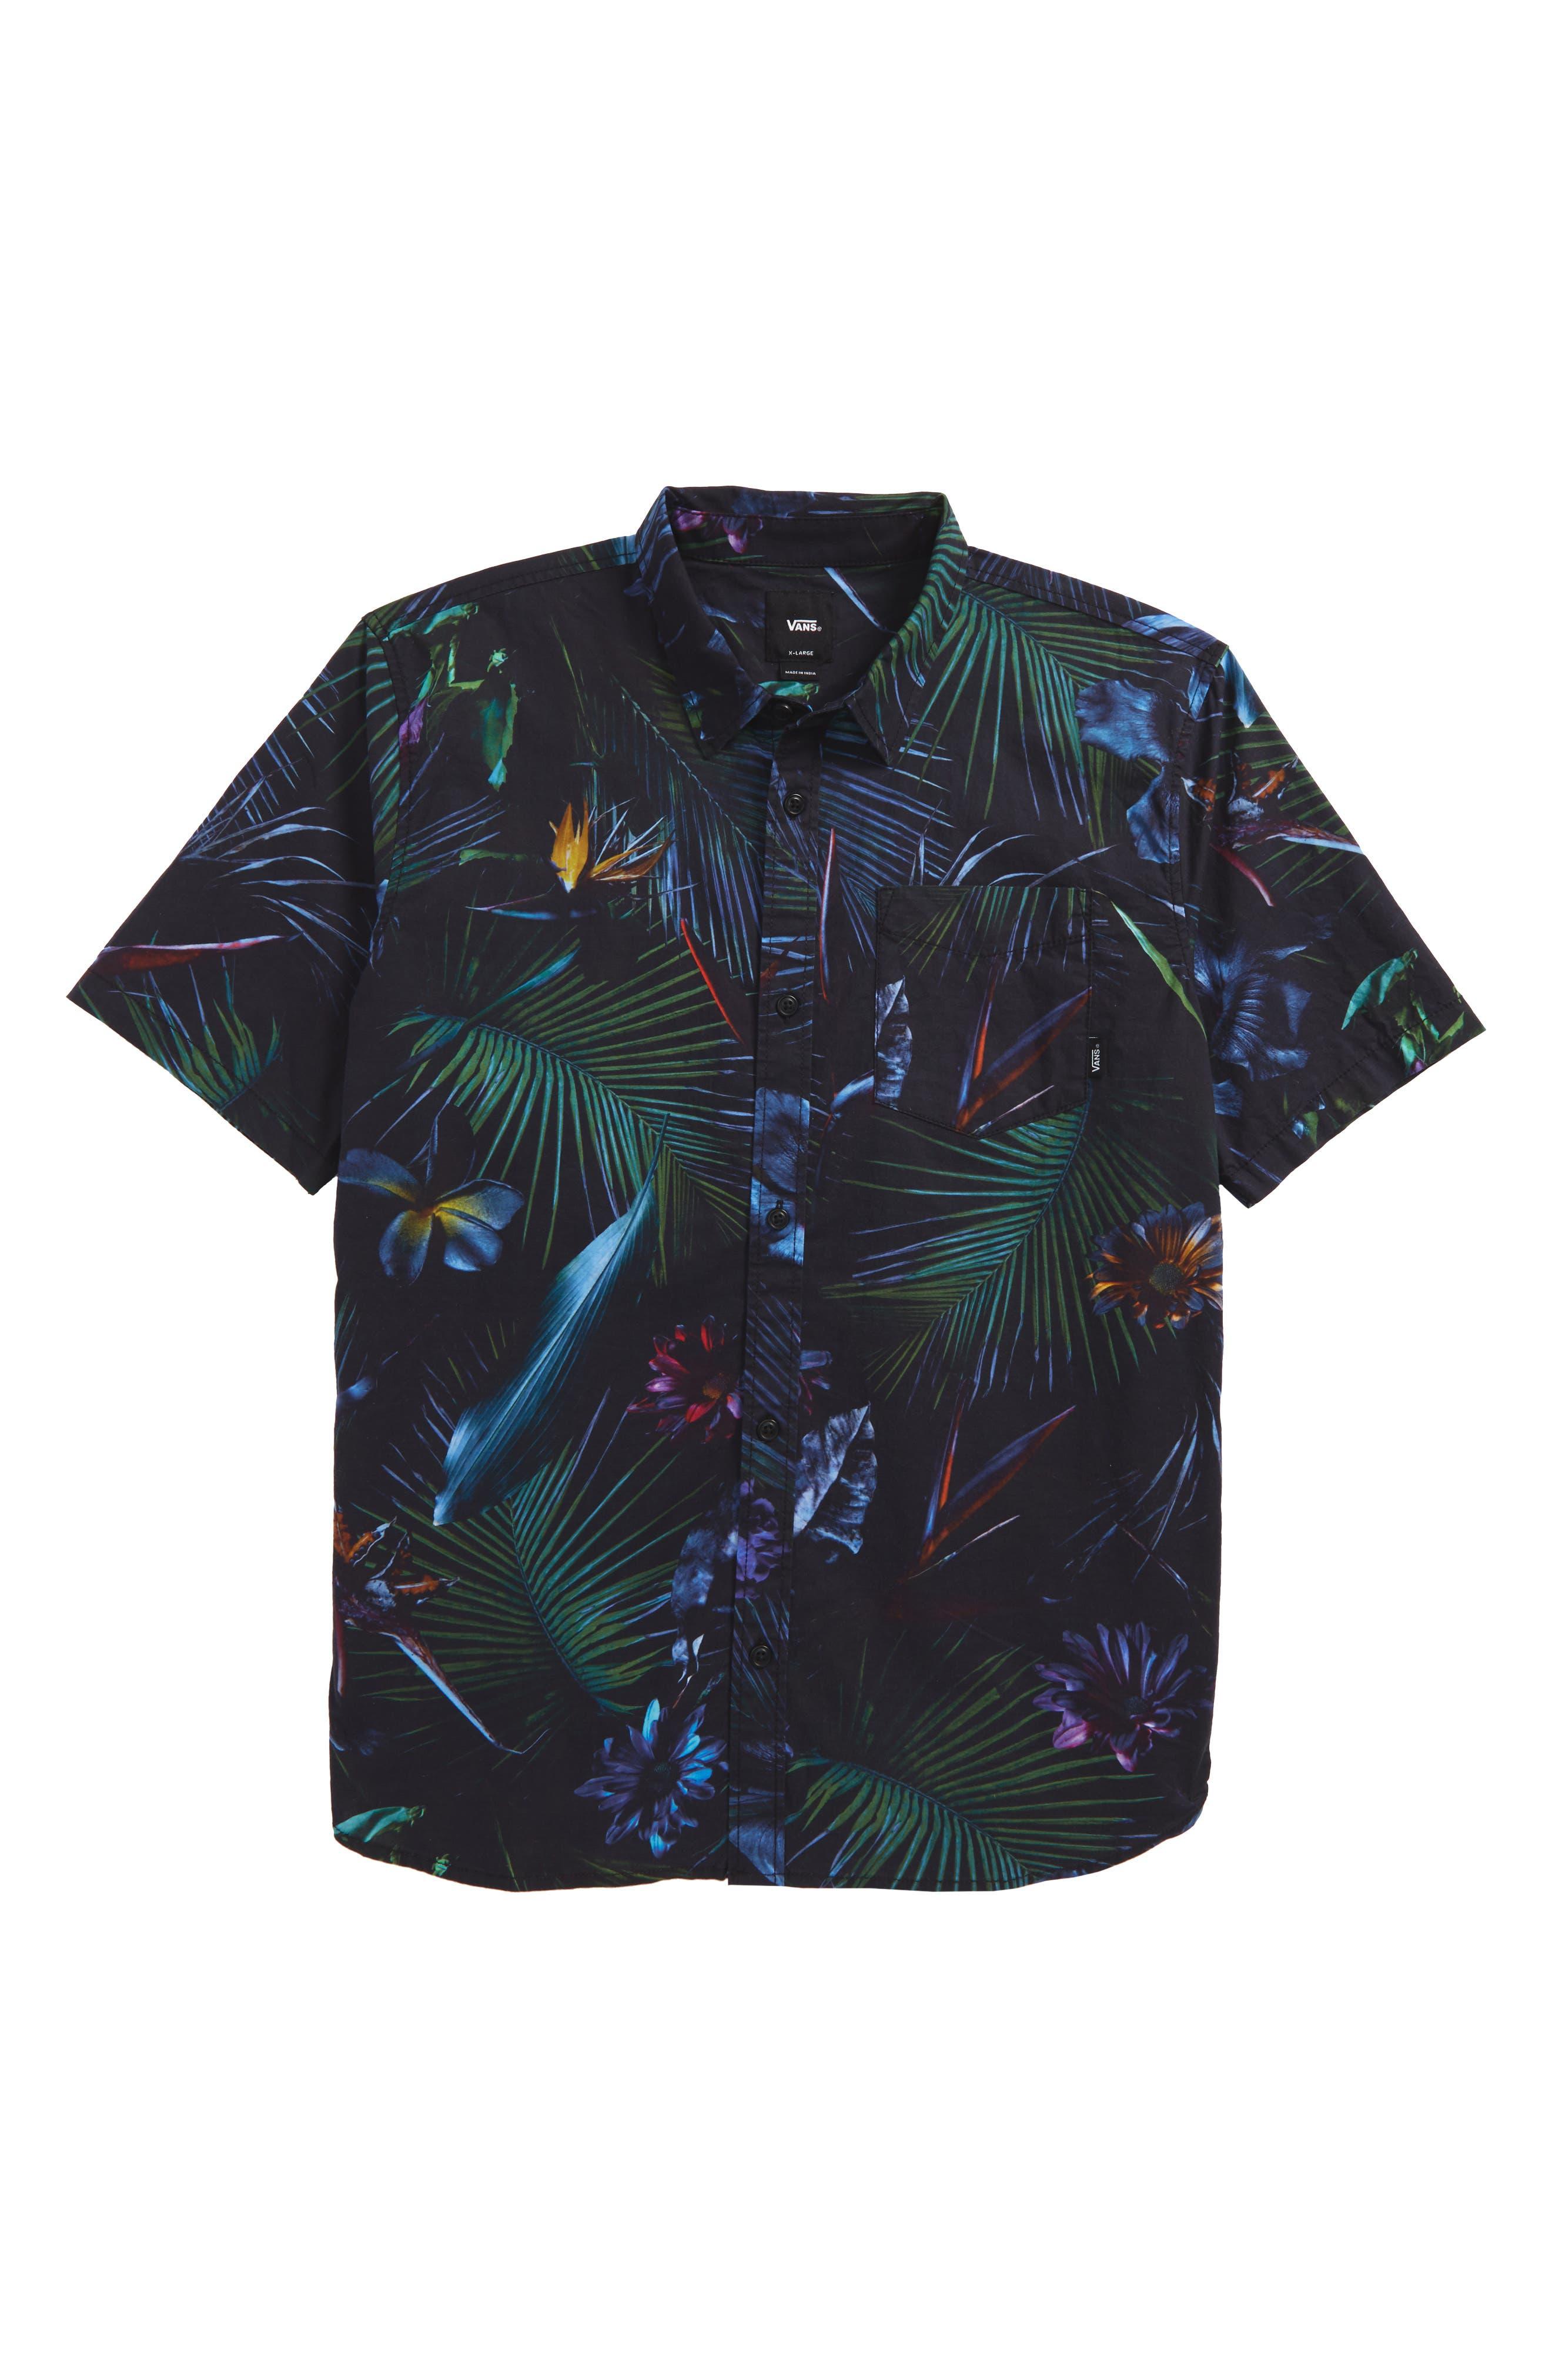 Neo Jungle Short Sleeve Woven Shirt,                             Main thumbnail 1, color,                             Neo Jungle